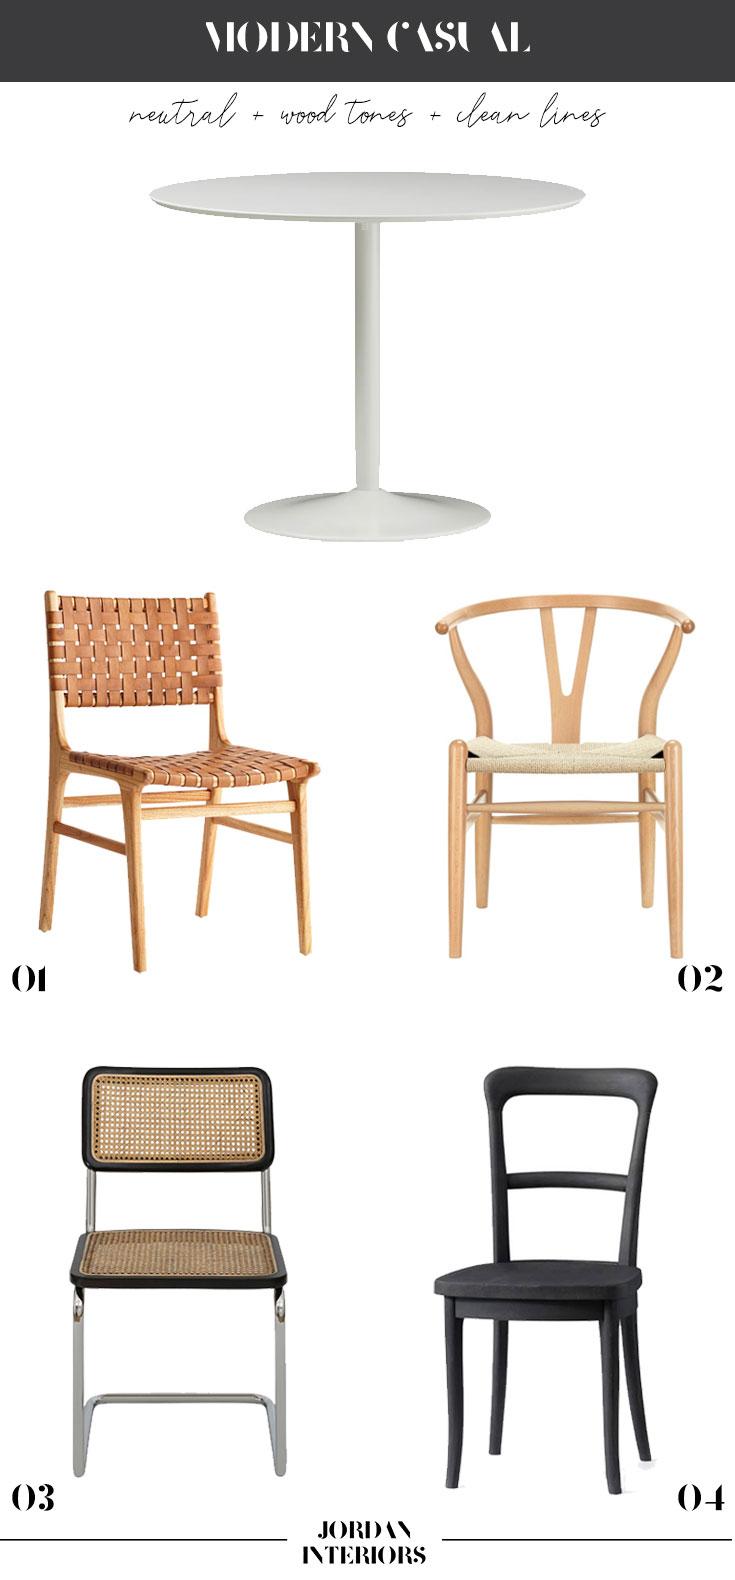 modern-casual-dining-room.jpg